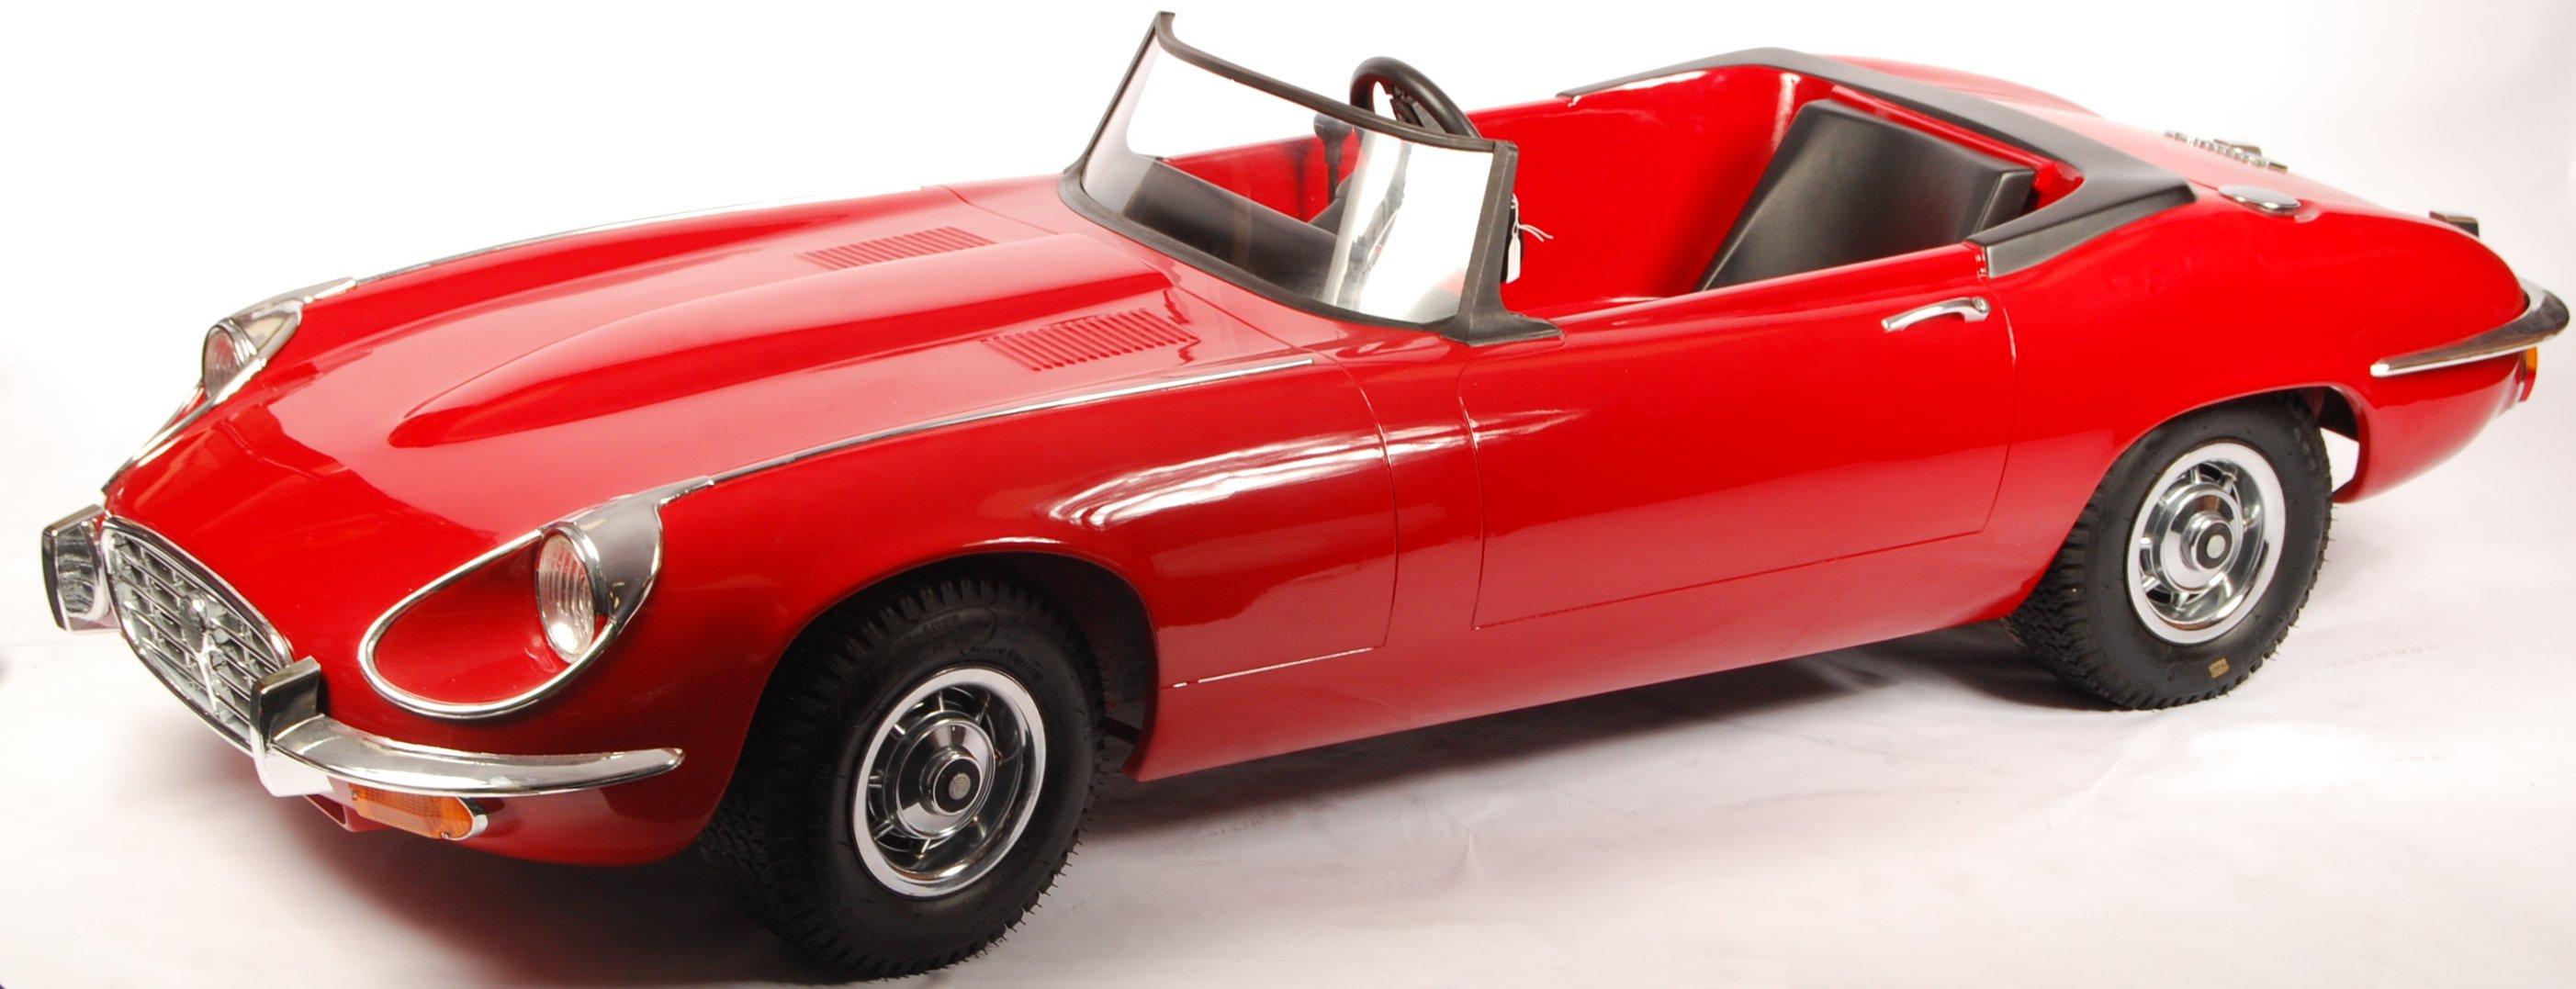 Lot 30 - RARE HARRODS MADE LIMITED EDITION JUNIOR E-TYPE JAGUAR CHILD'S CAR